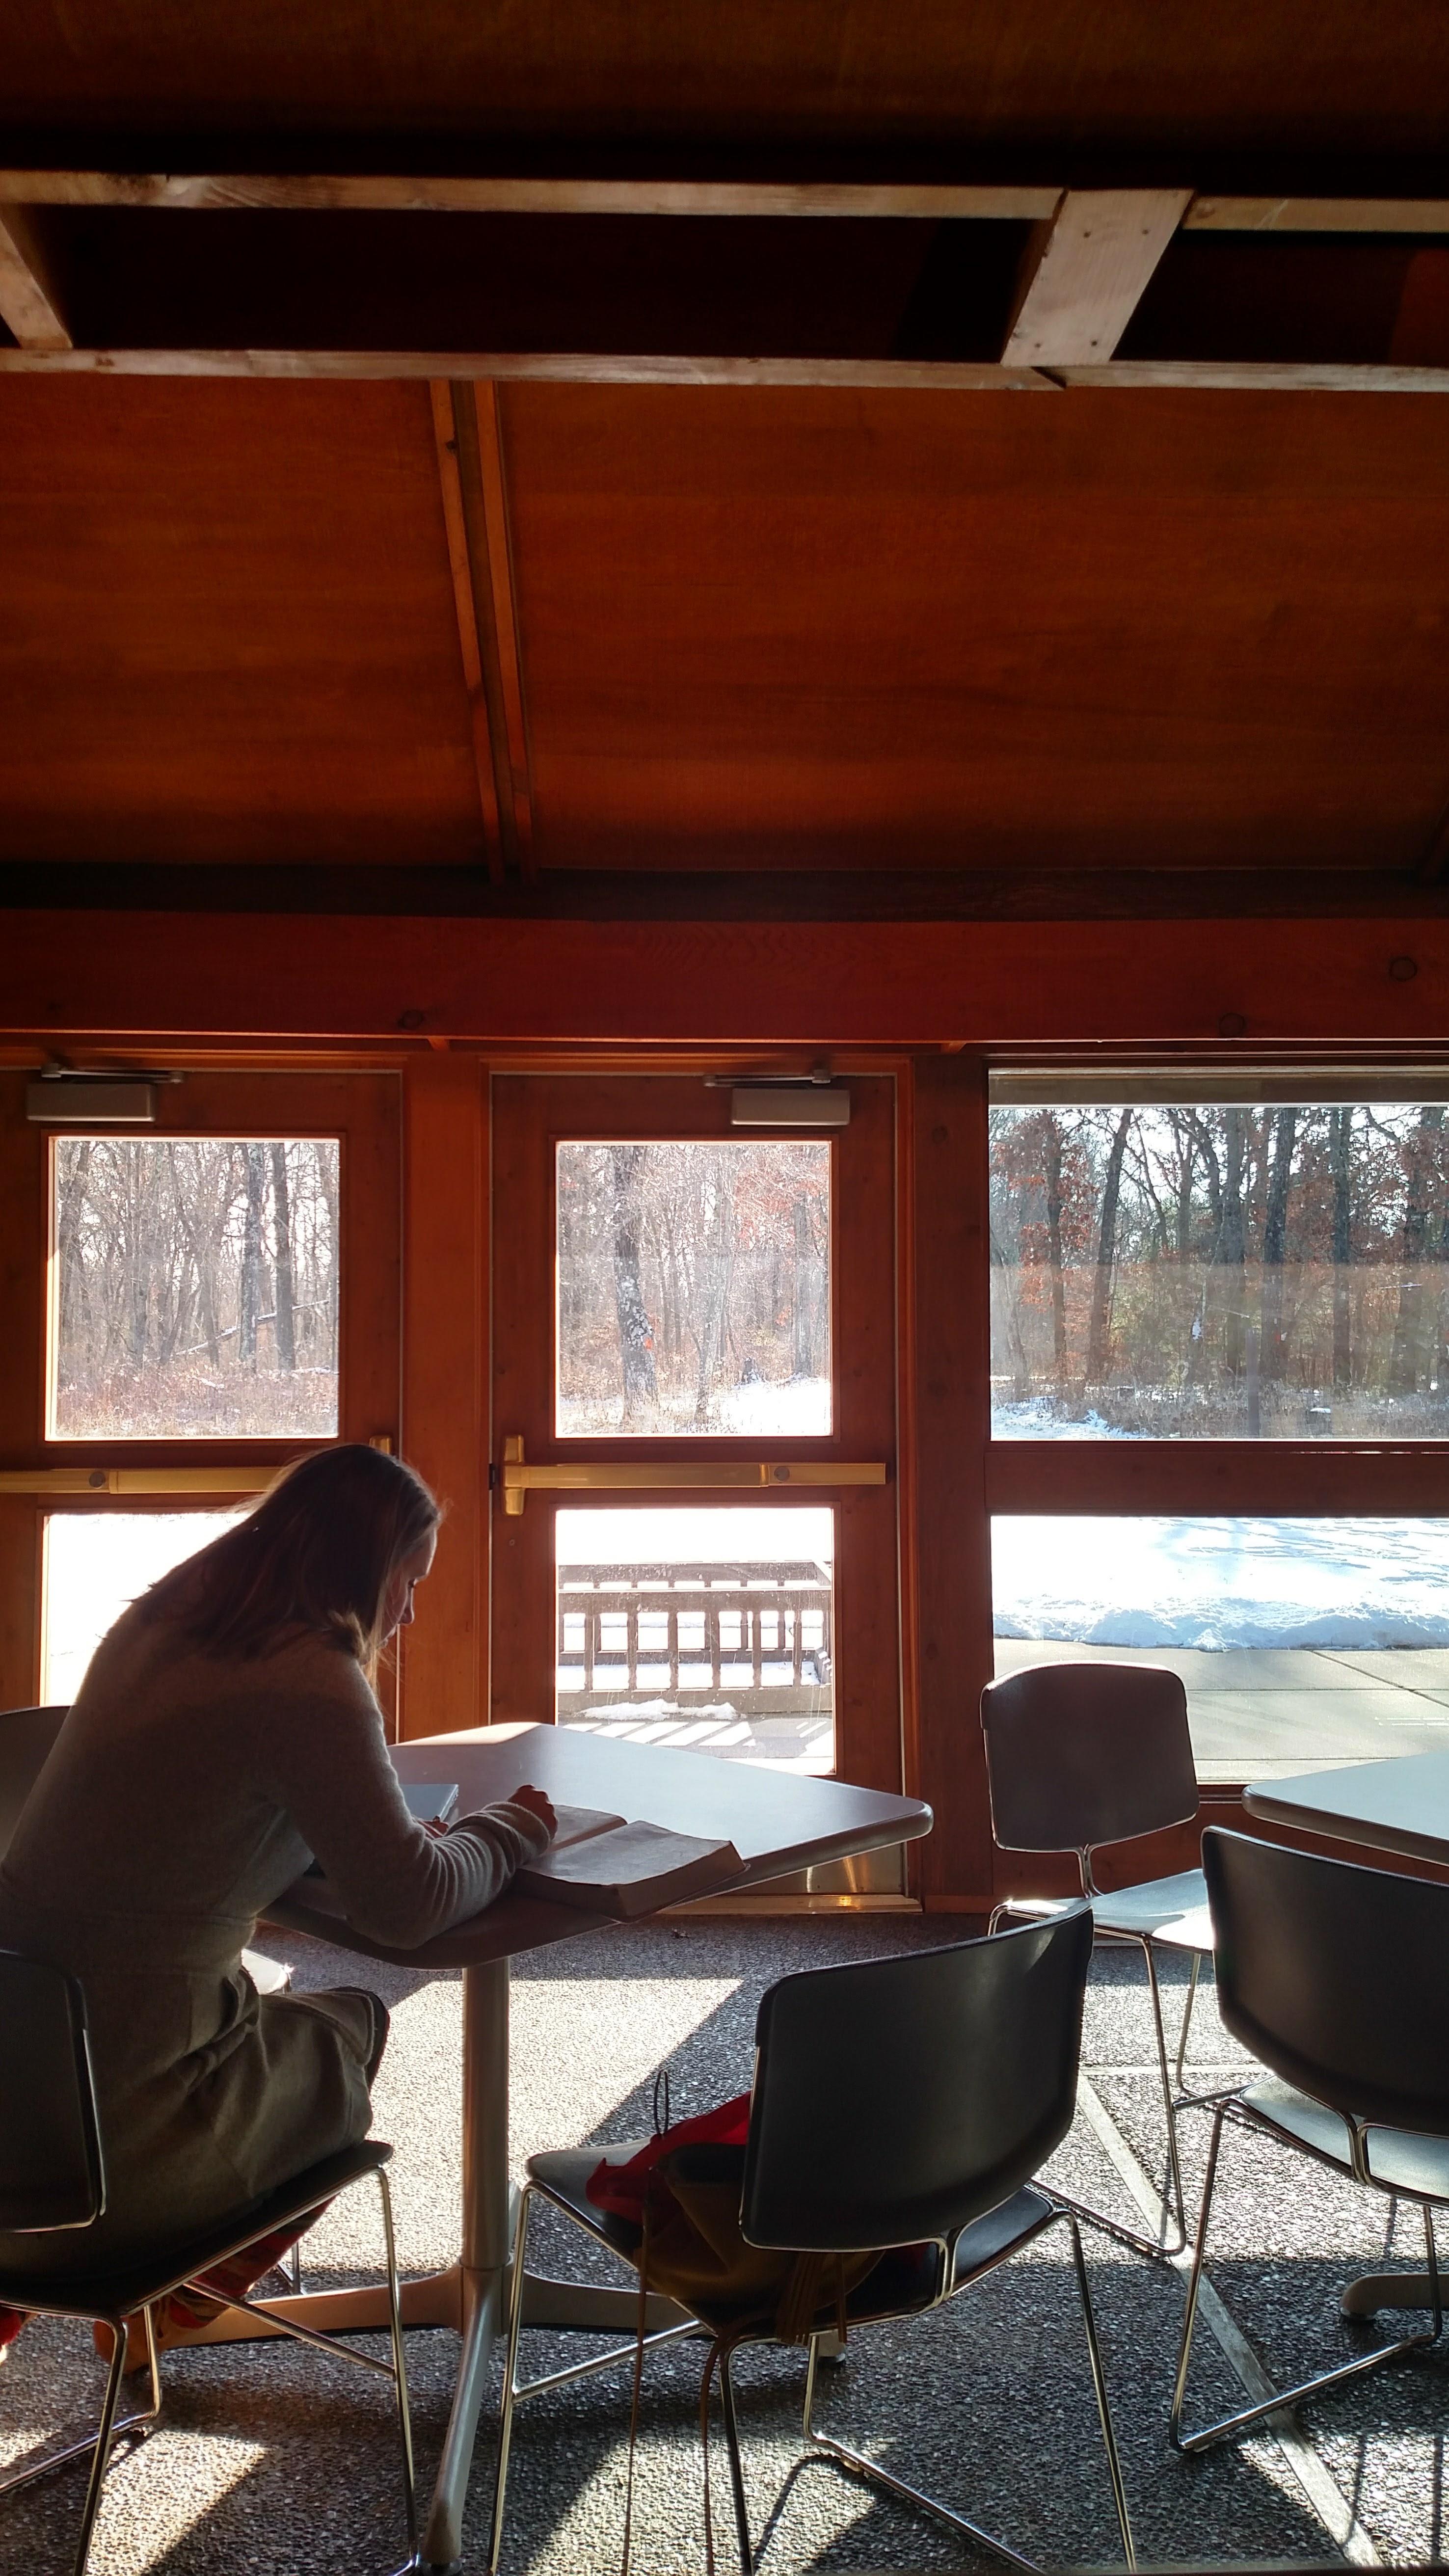 solitude writer state park vistor center